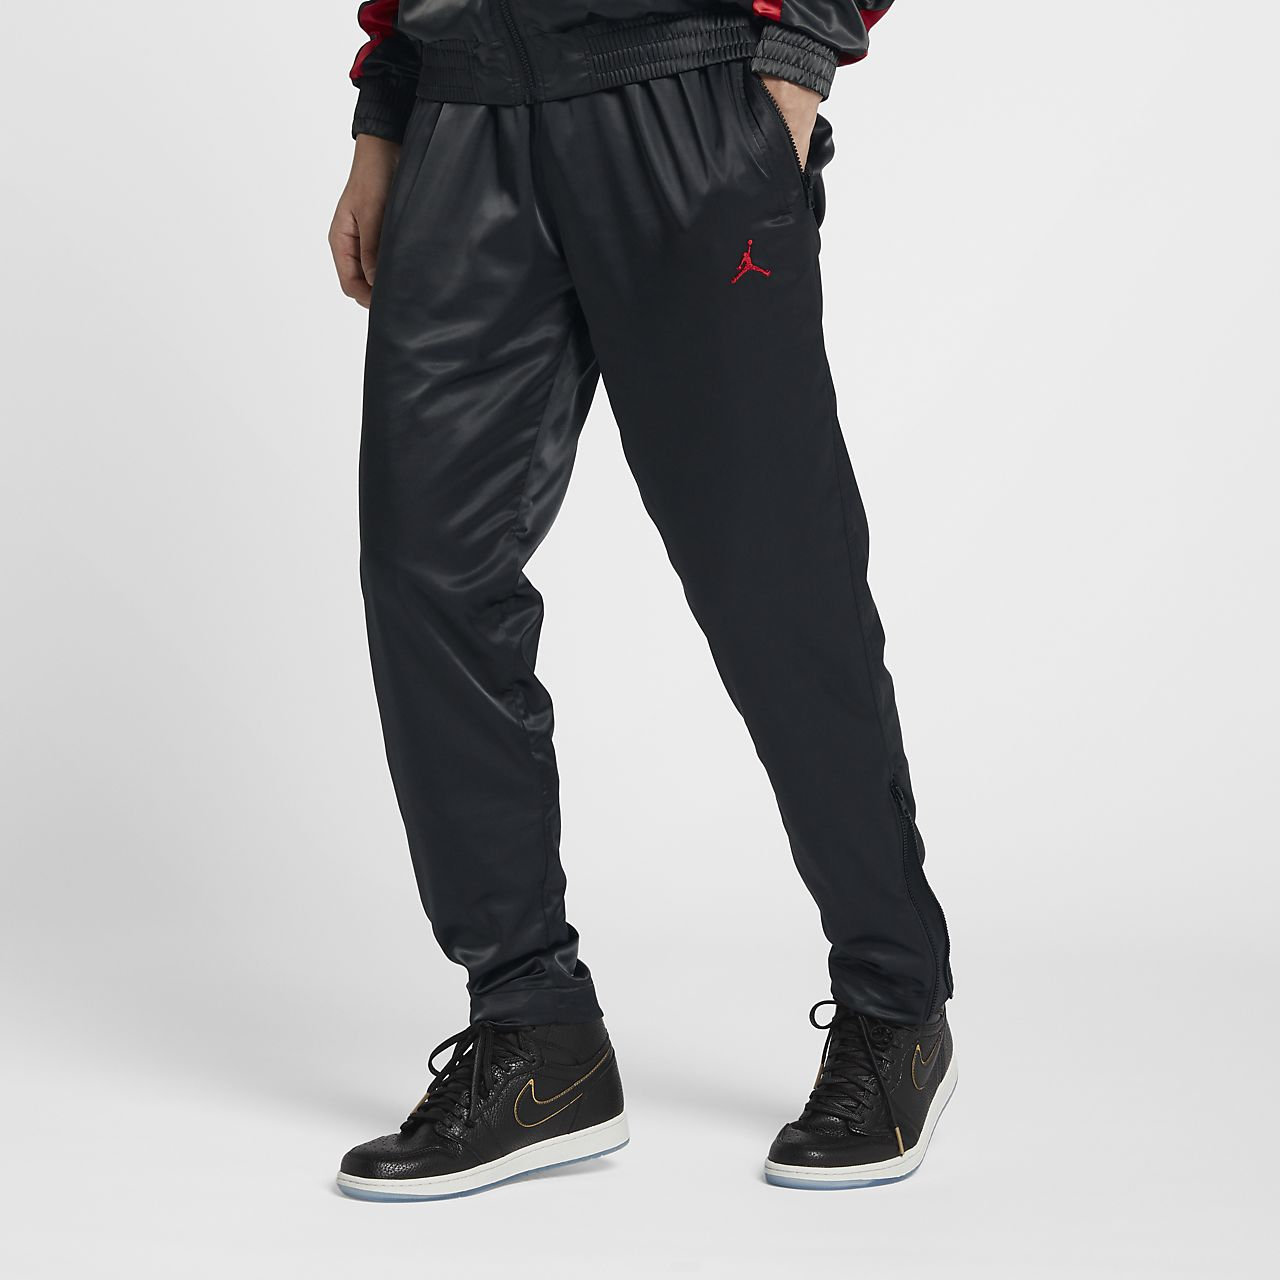 Jordan Sportswear AJ 5 Men's Pants